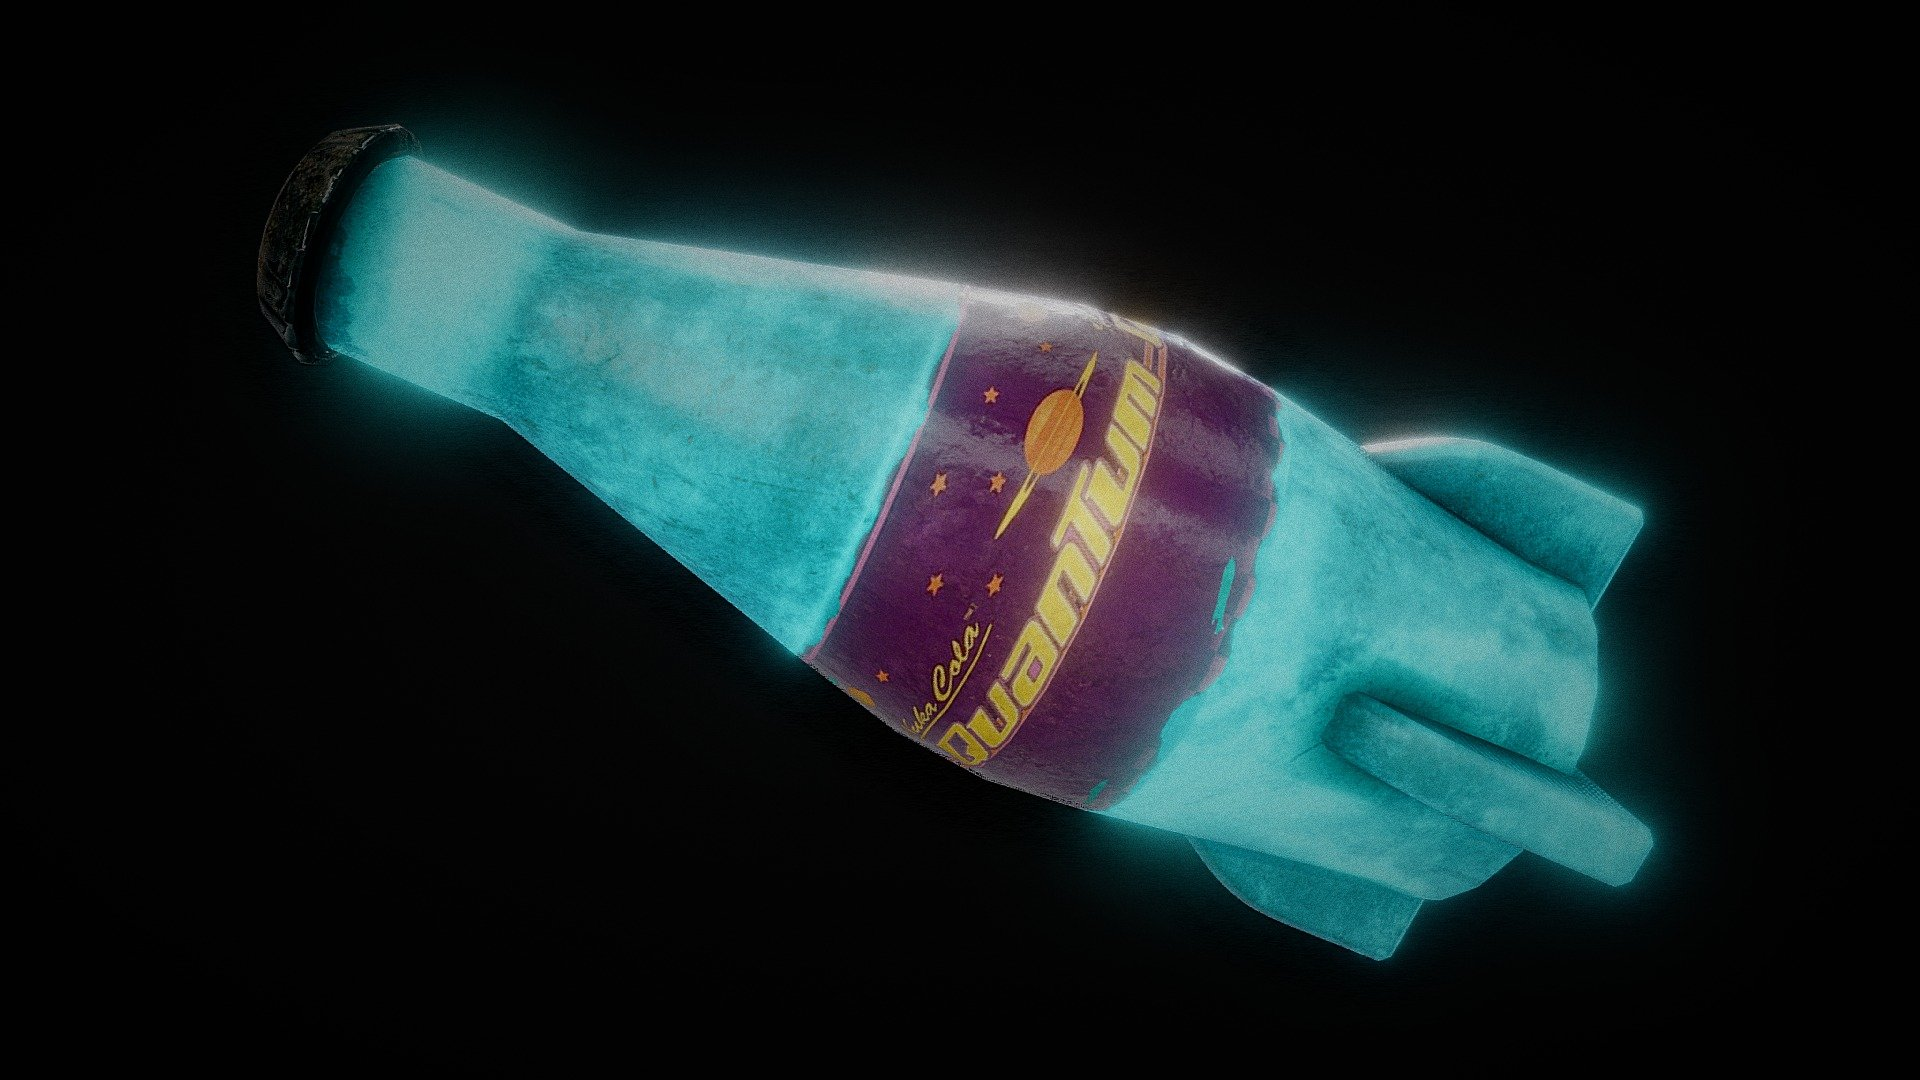 Fallout 4 Nuka Cola Quantum 3d Model By Michael Harris